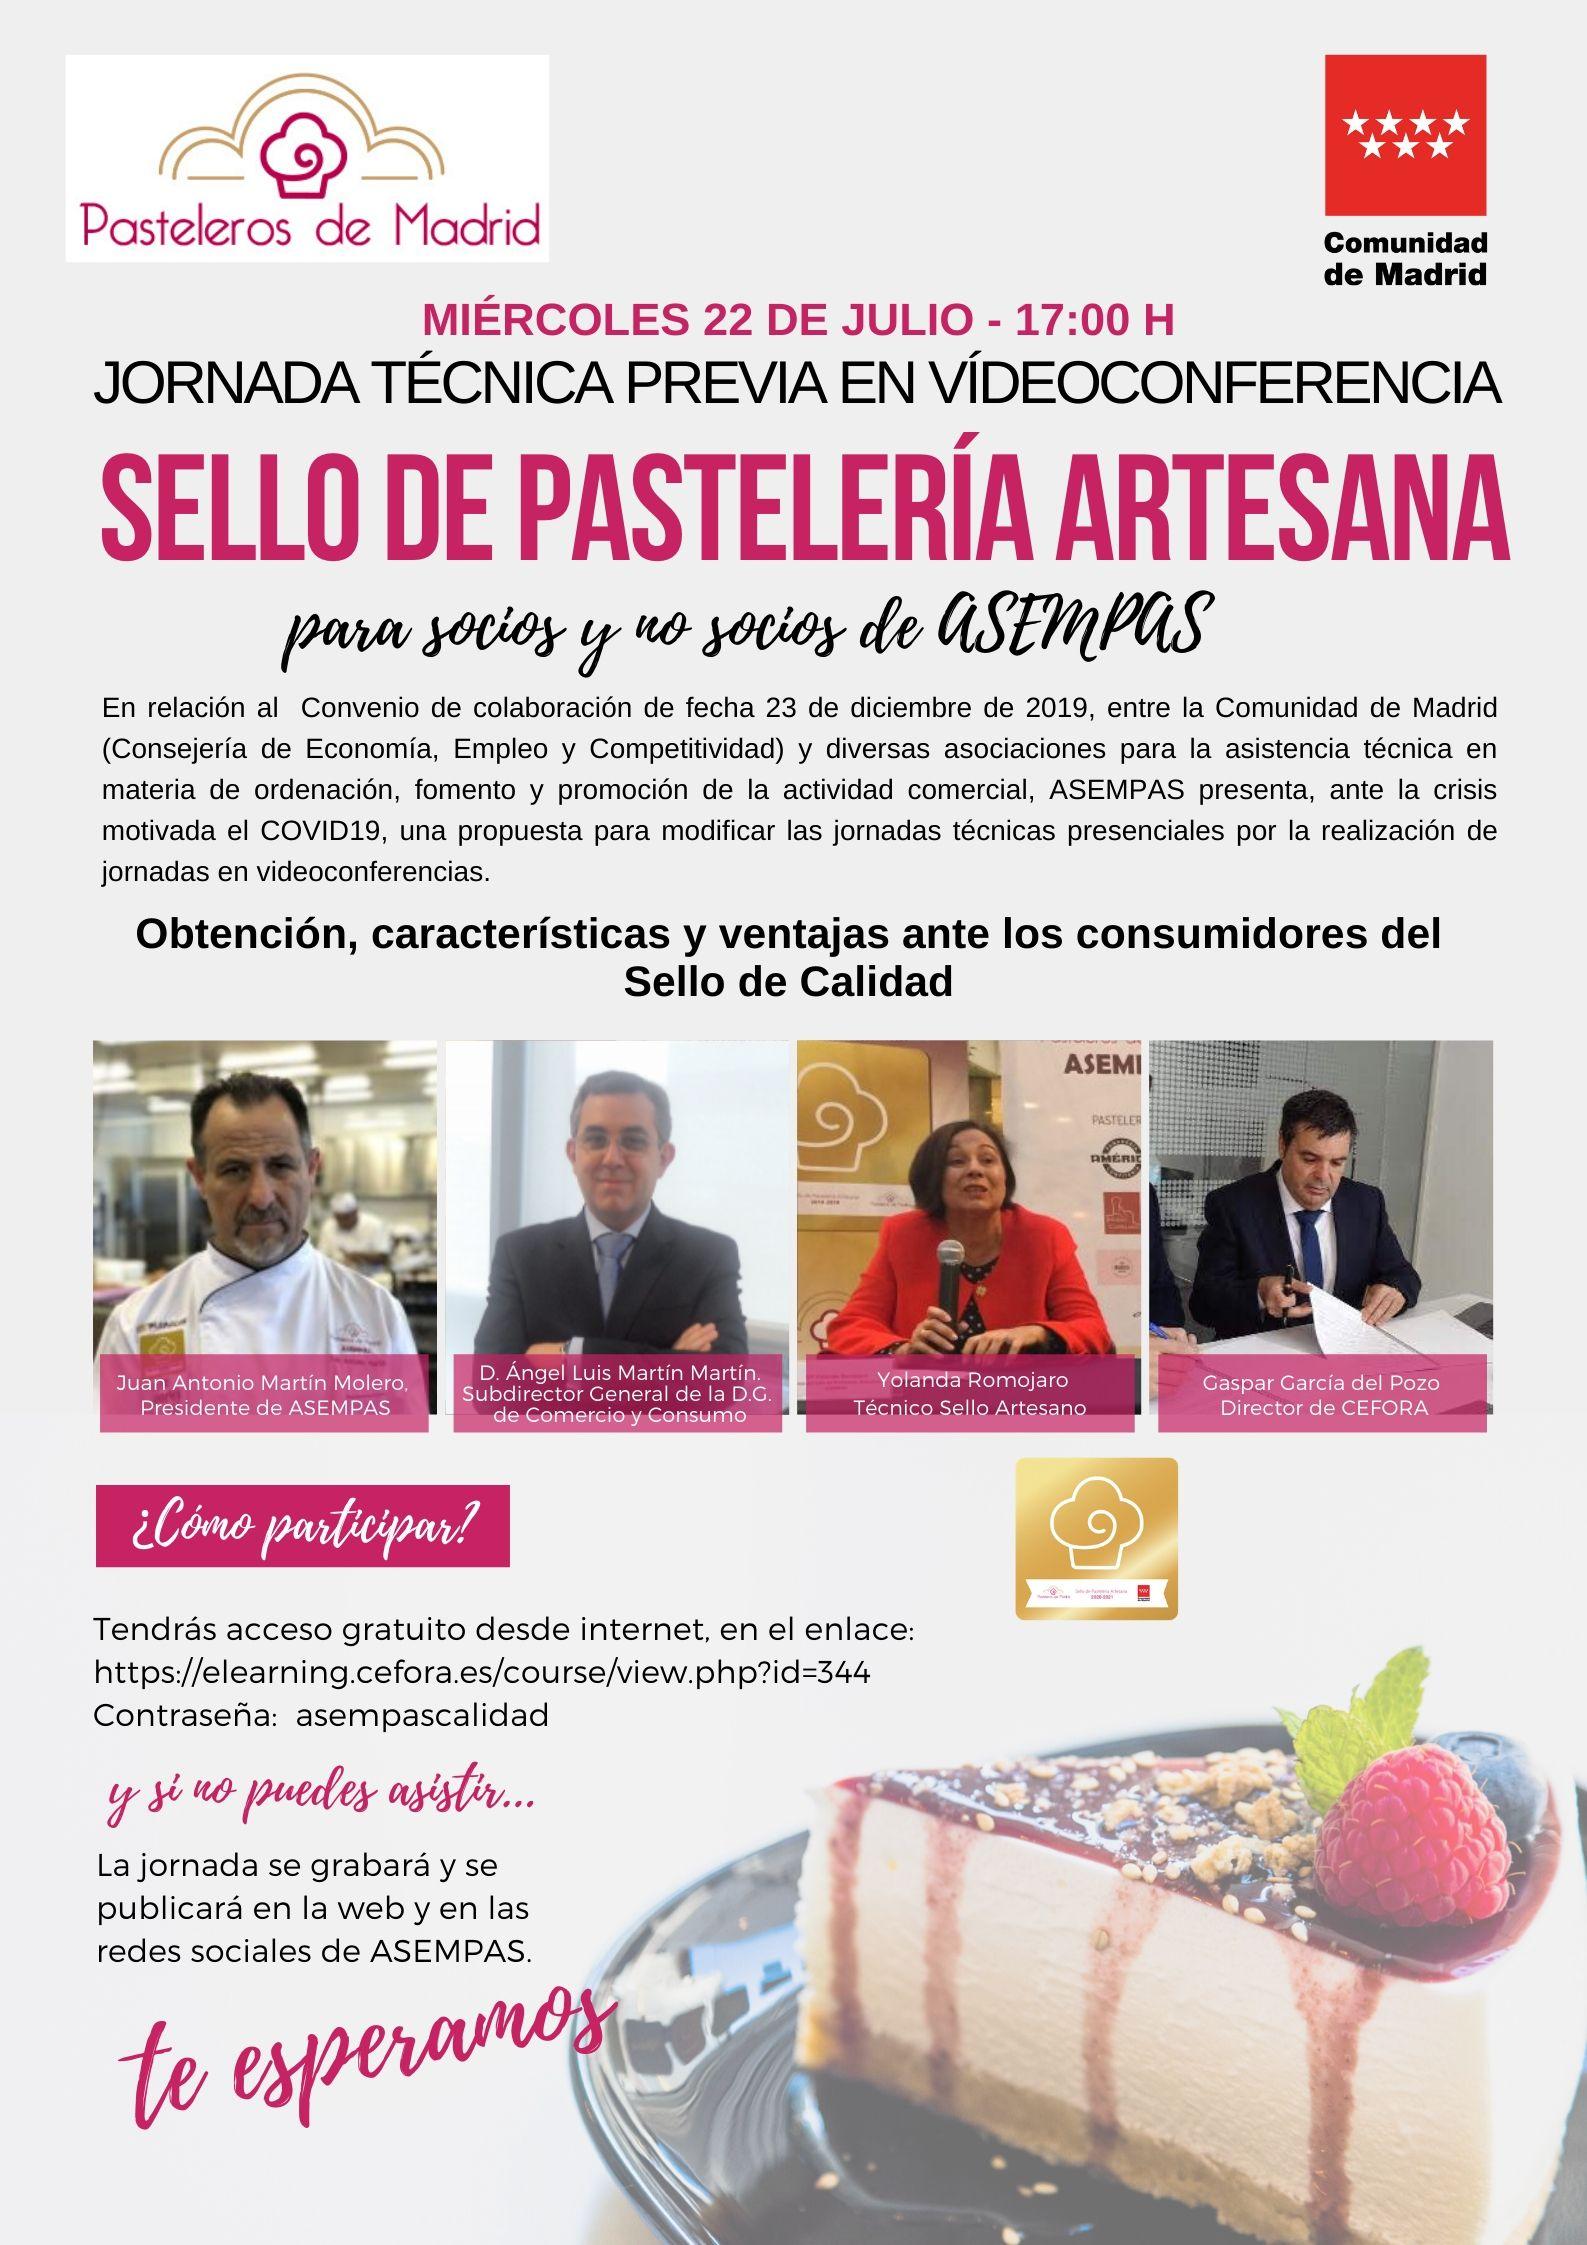 JORNADA TÉCNICA SELLO ARTESANO DE PASTELERÍA